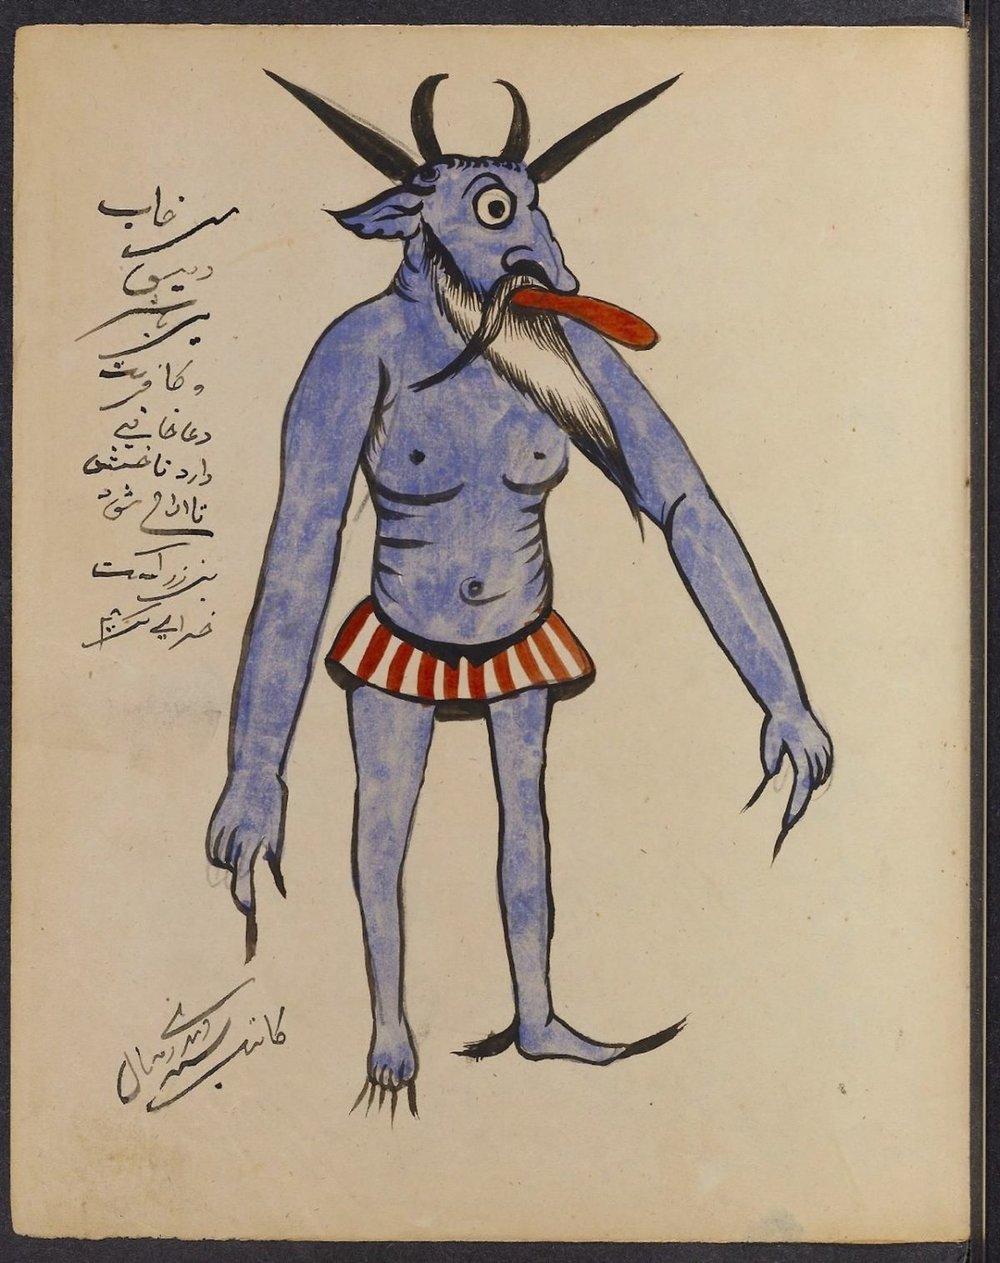 Iran-Demons-20-1200x1516.jpg